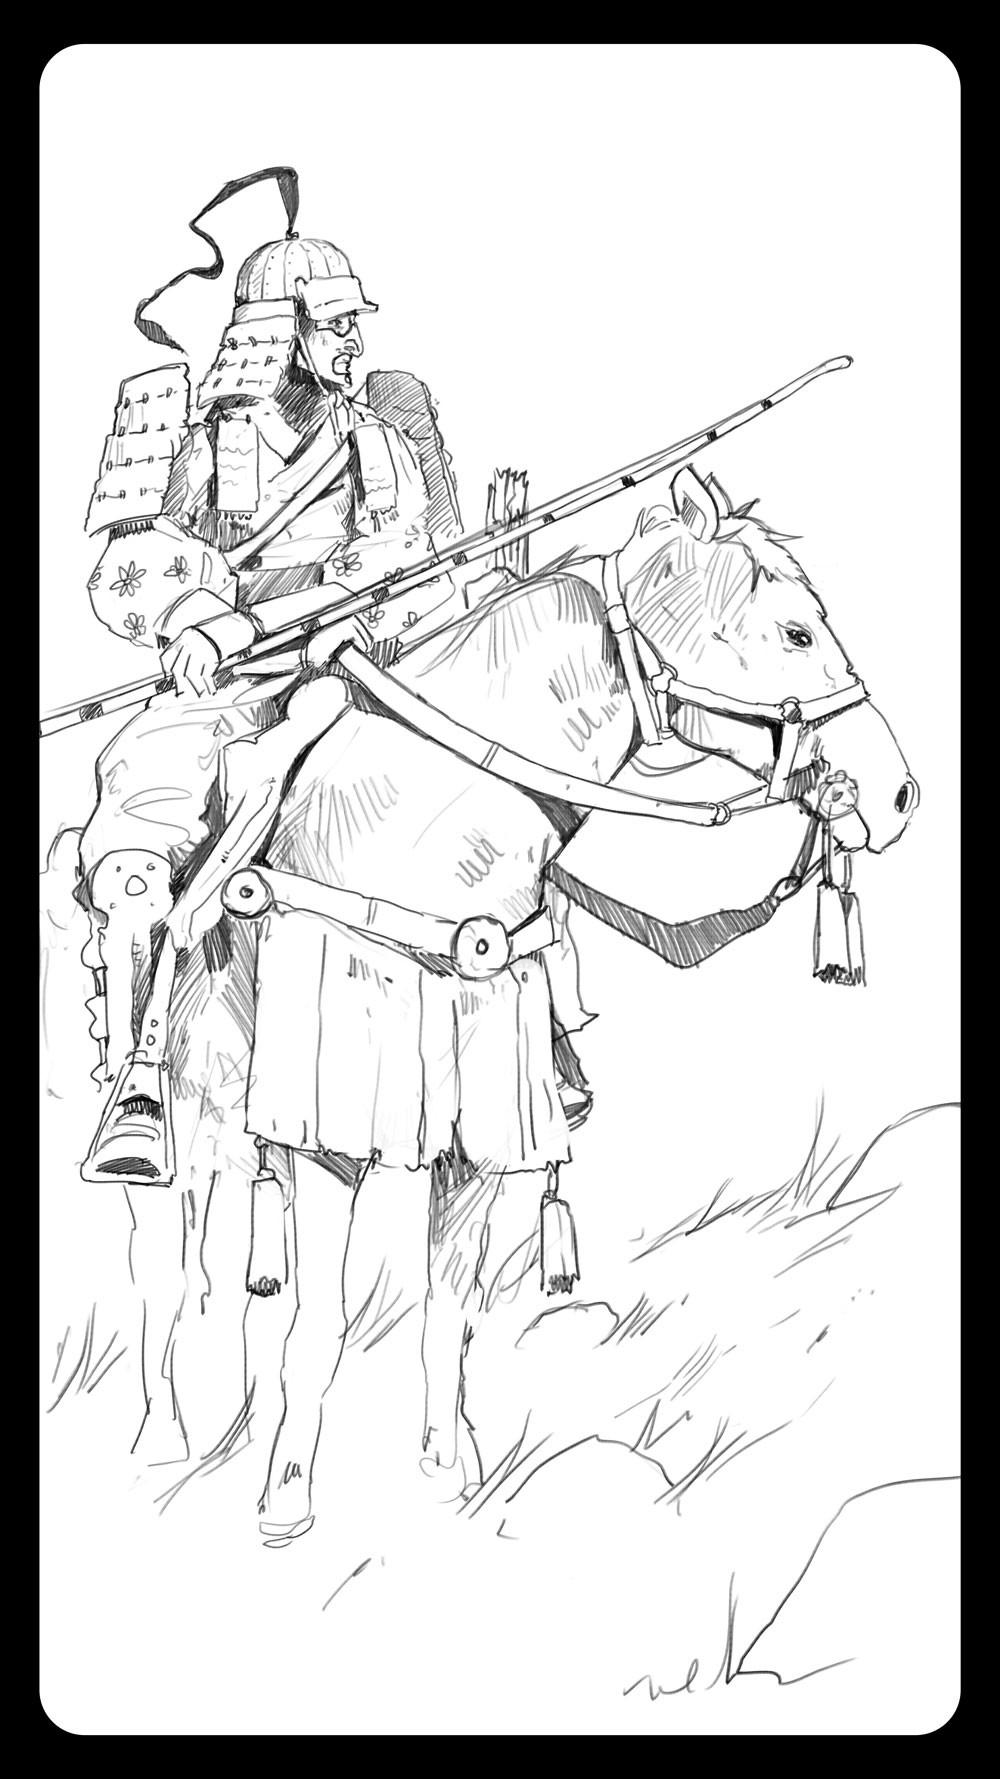 Dominik mayer samurai archer back sketch